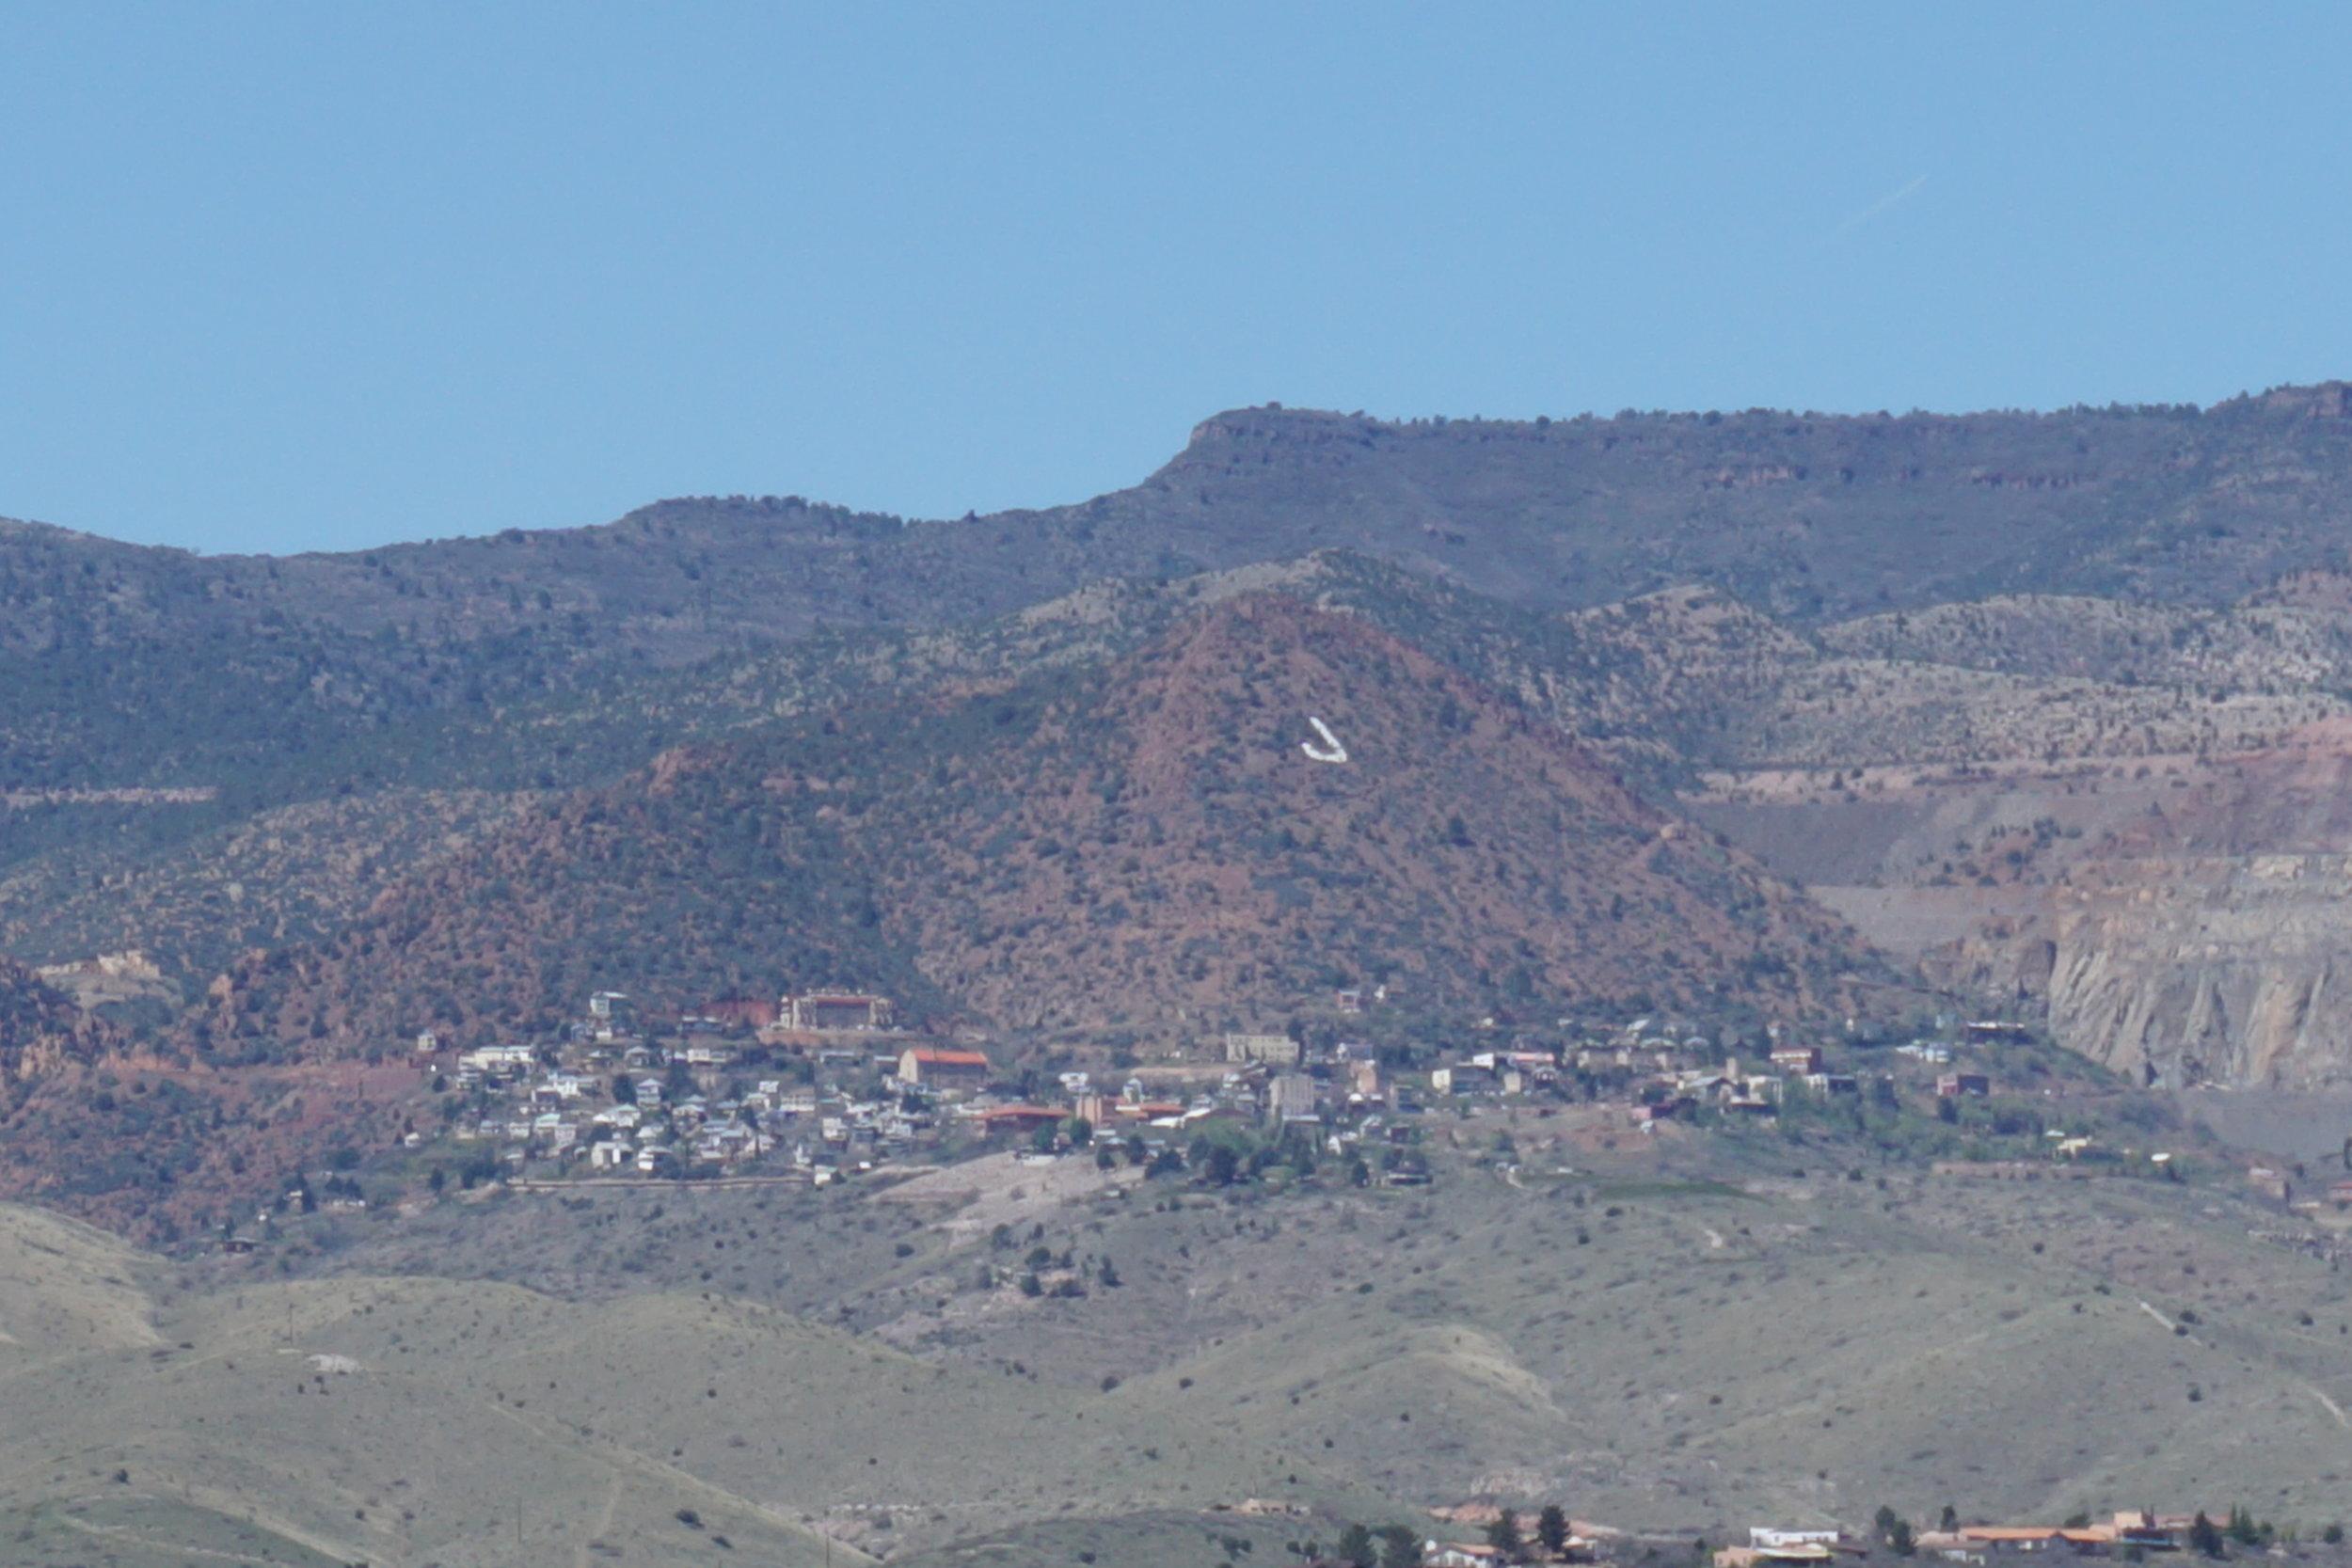 Jerome, AZ as seen from Tuzigoot National Monument outside of Cottonwood, AZ